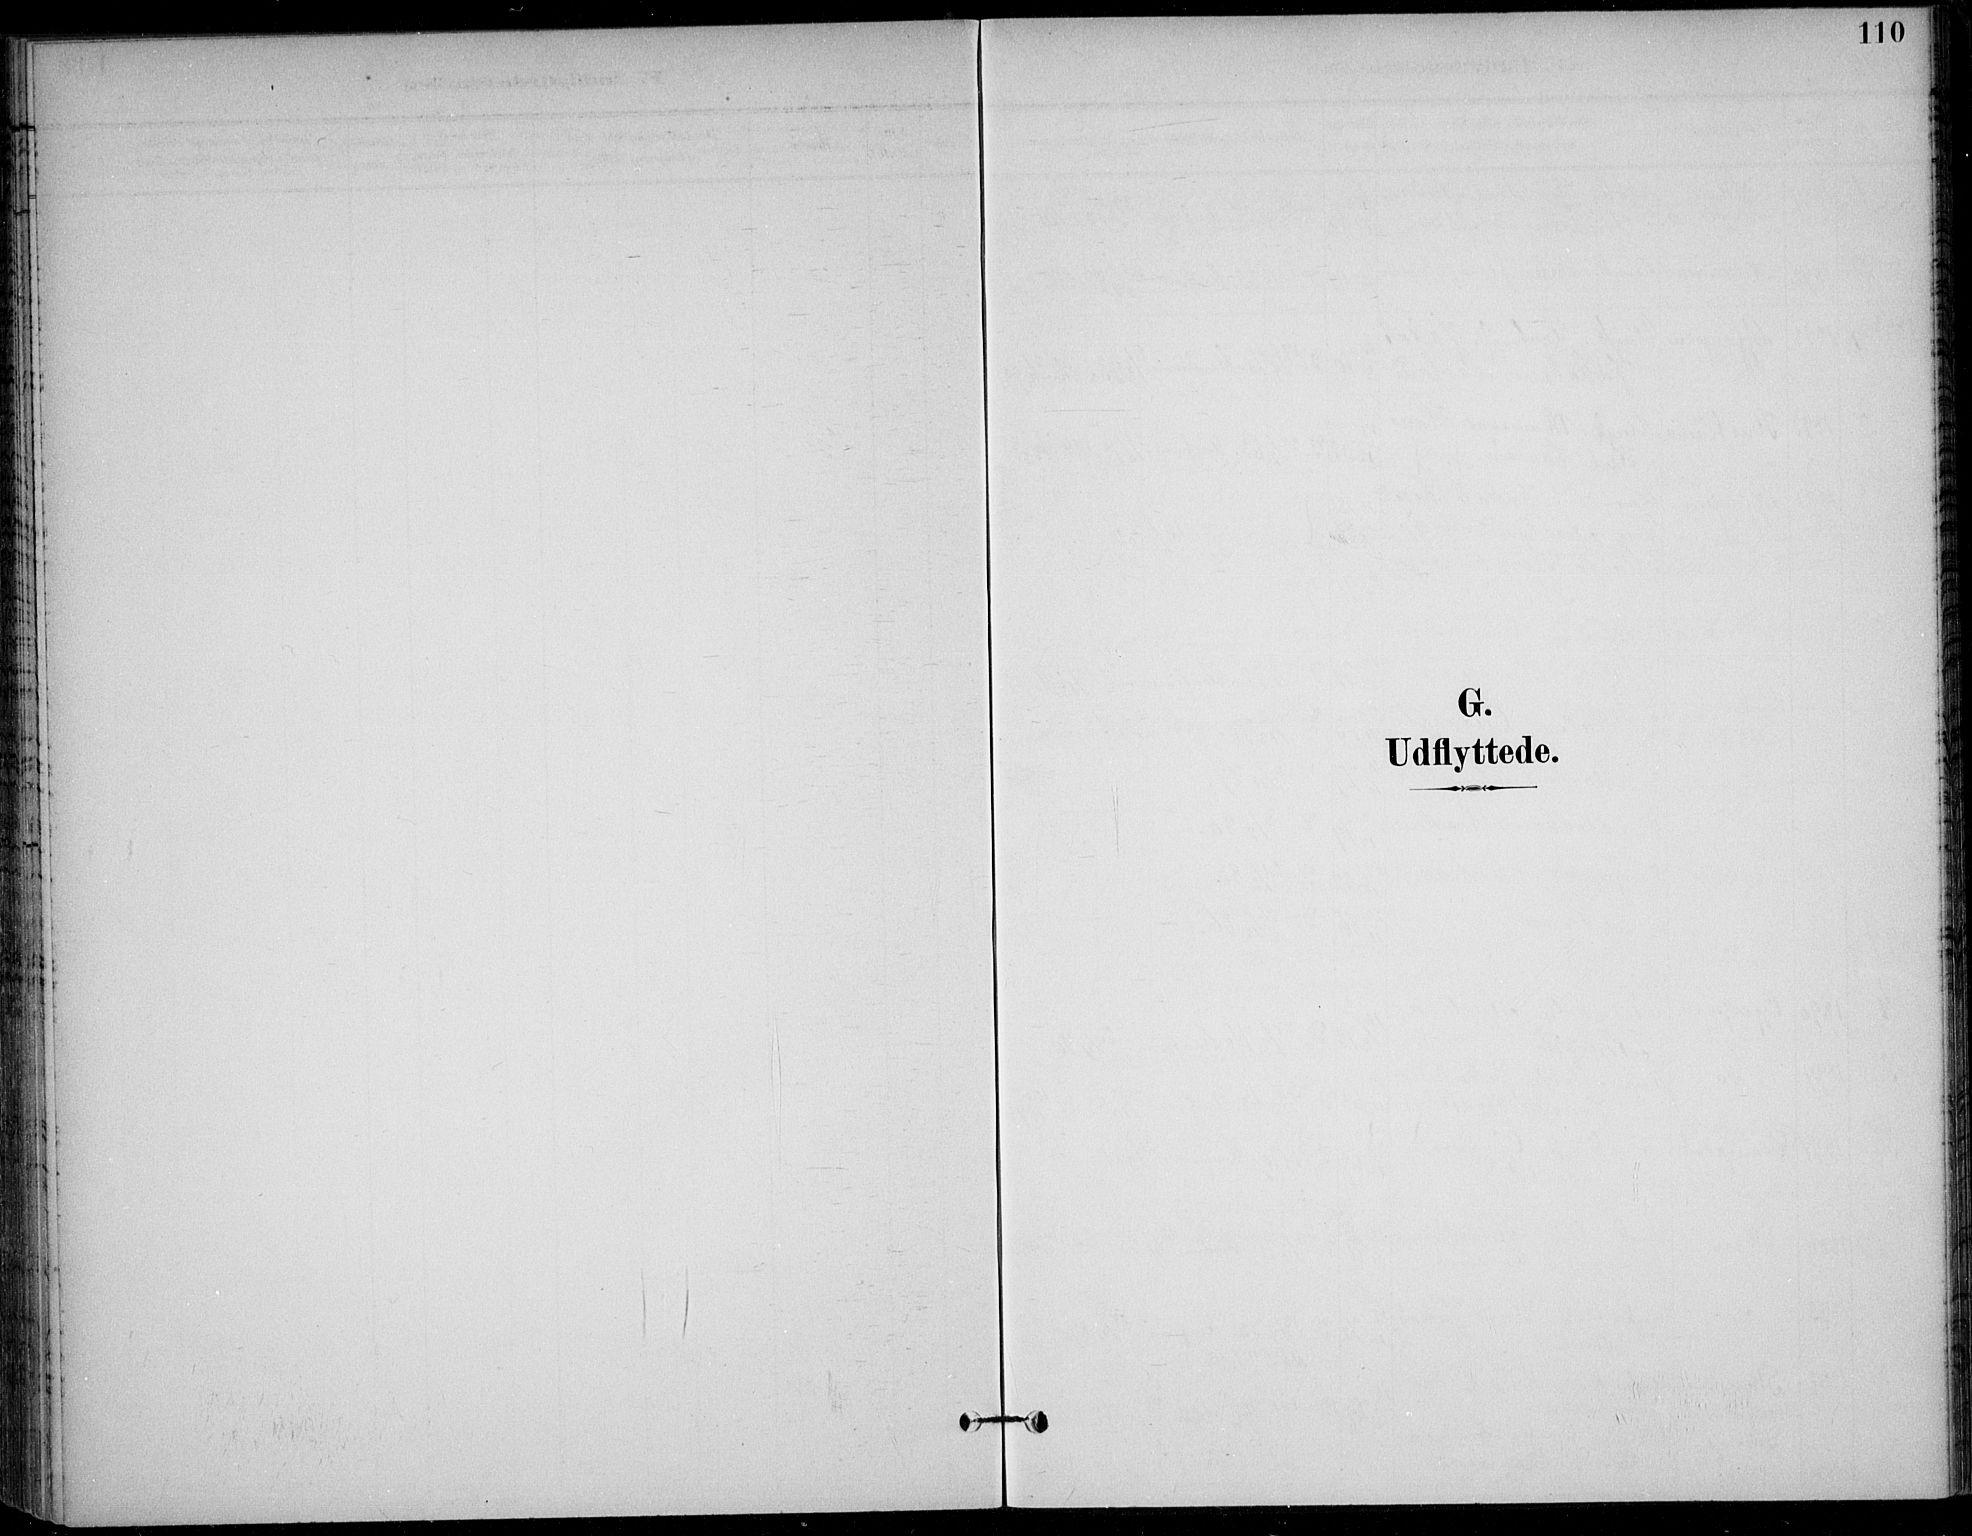 SAKO, Solum kirkebøker, F/Fc/L0002: Ministerialbok nr. III 2, 1892-1906, s. 110